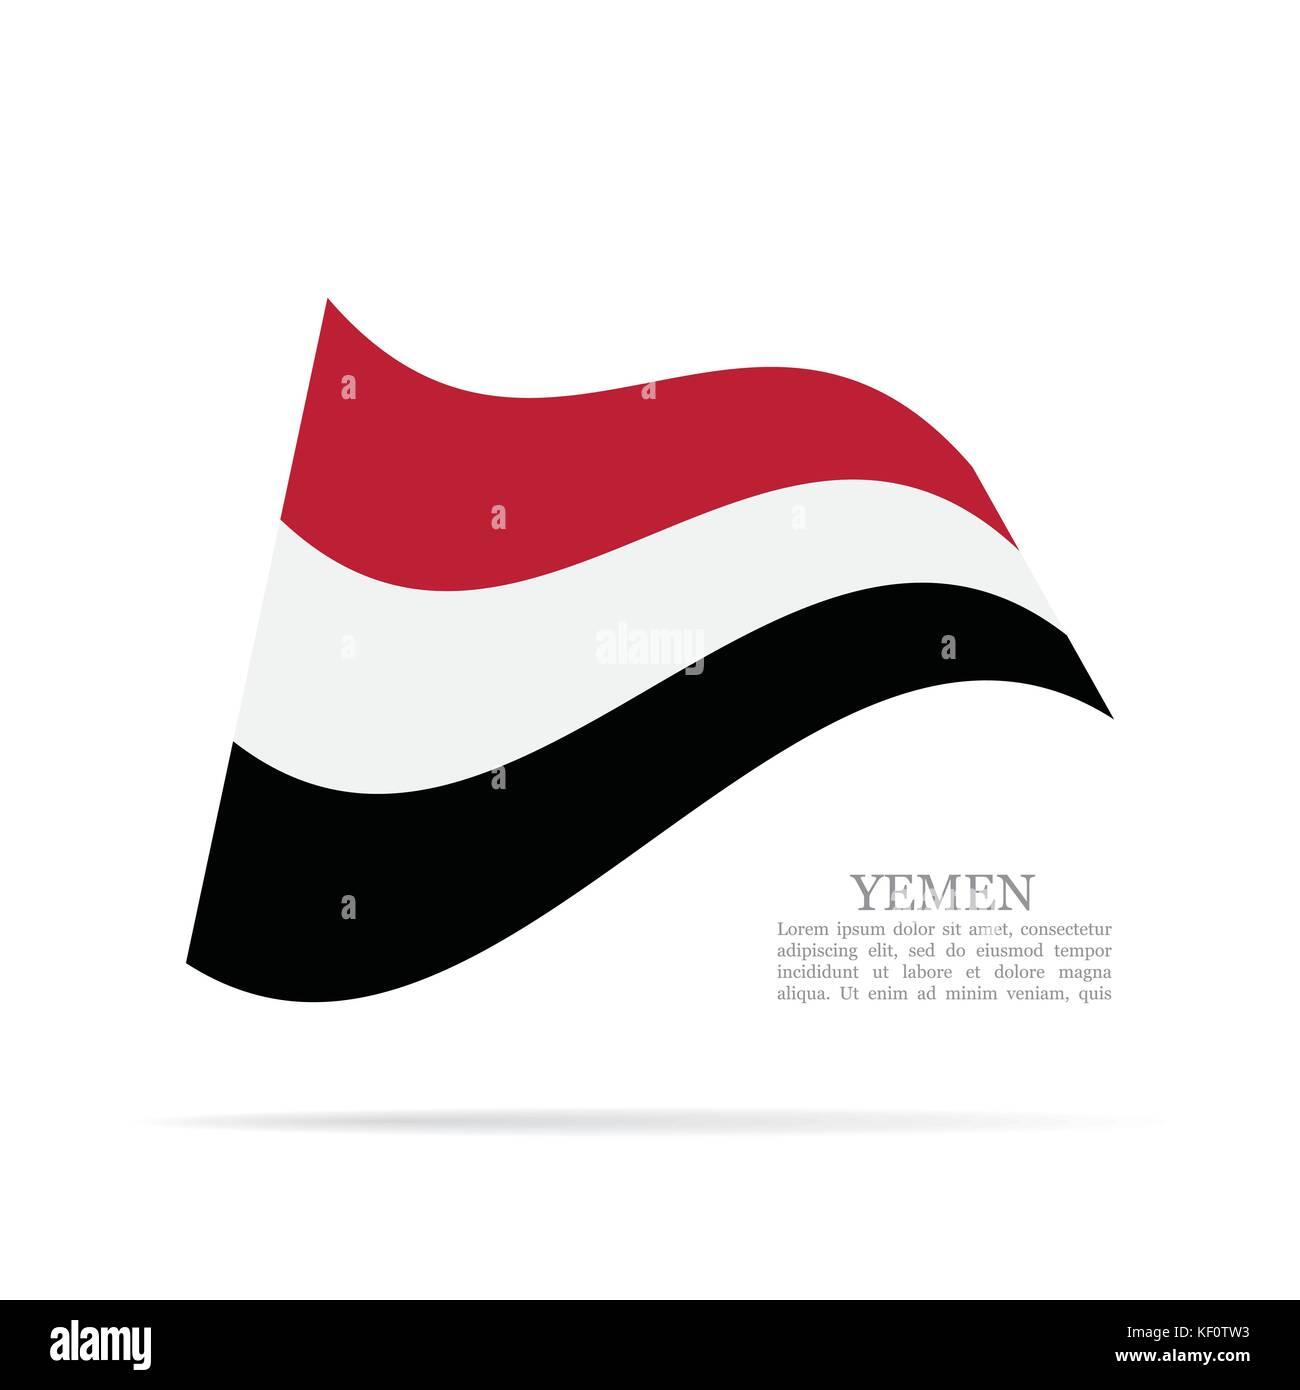 Yemen national flag waving vector icon - Stock Image